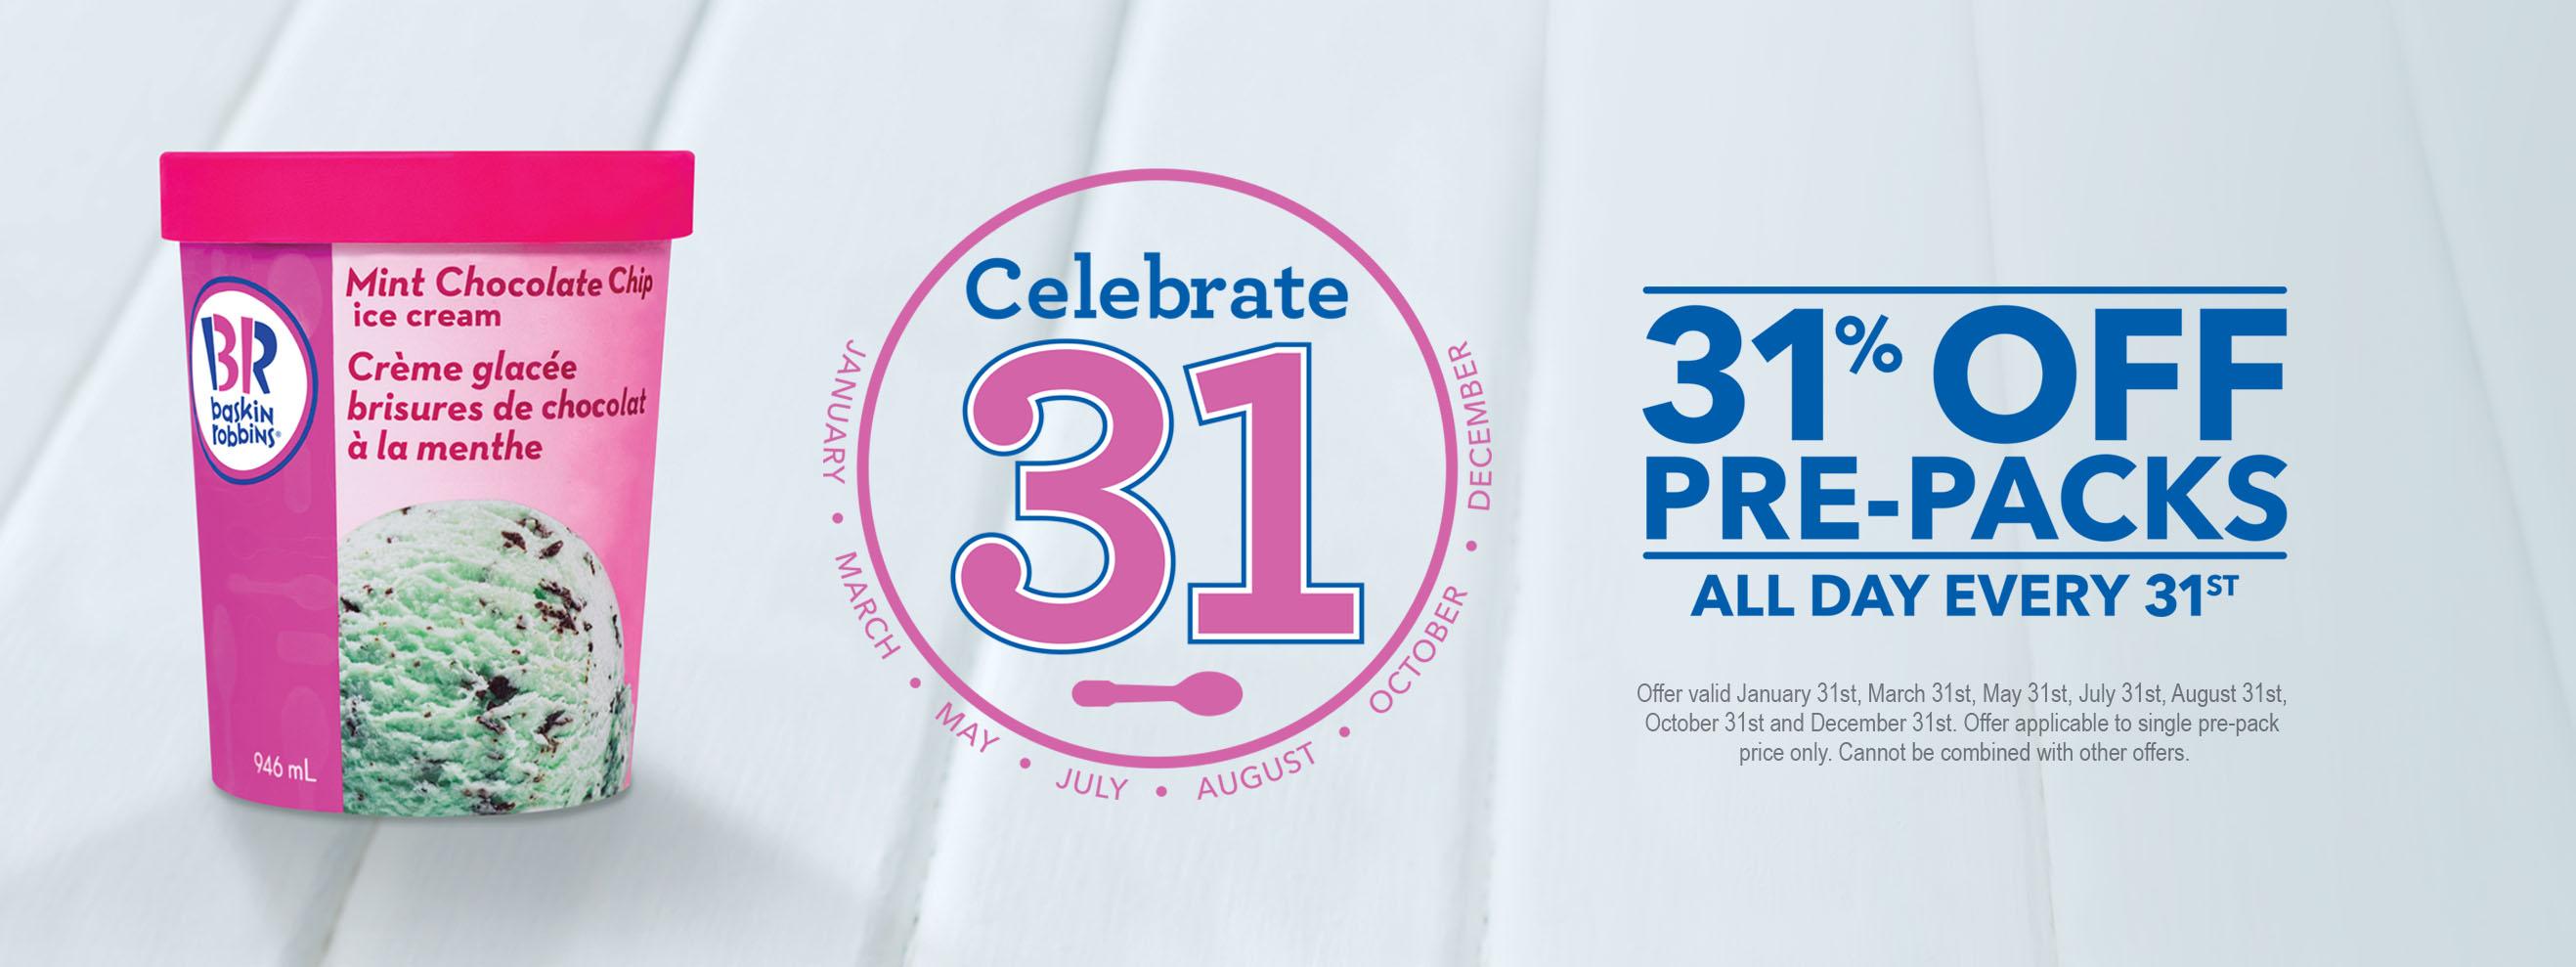 Baskin Robbins] 31% off pre-packed - RedFlagDeals com Forums